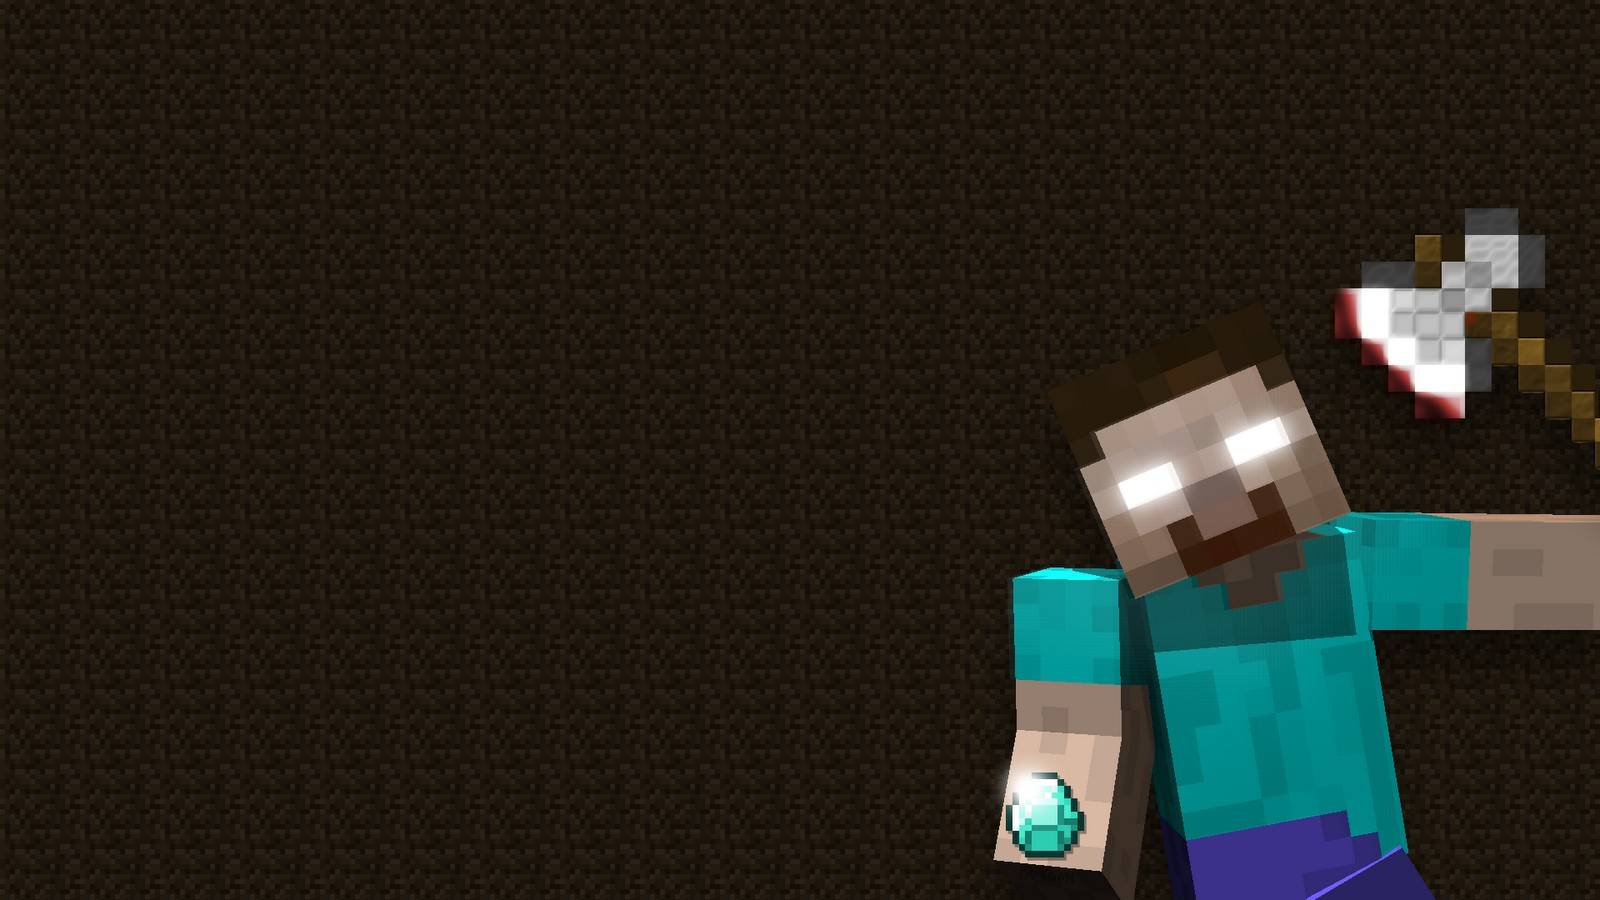 Herobrine Wallpapers HD Wallpaper Cave - Minecraft herobrine spiele